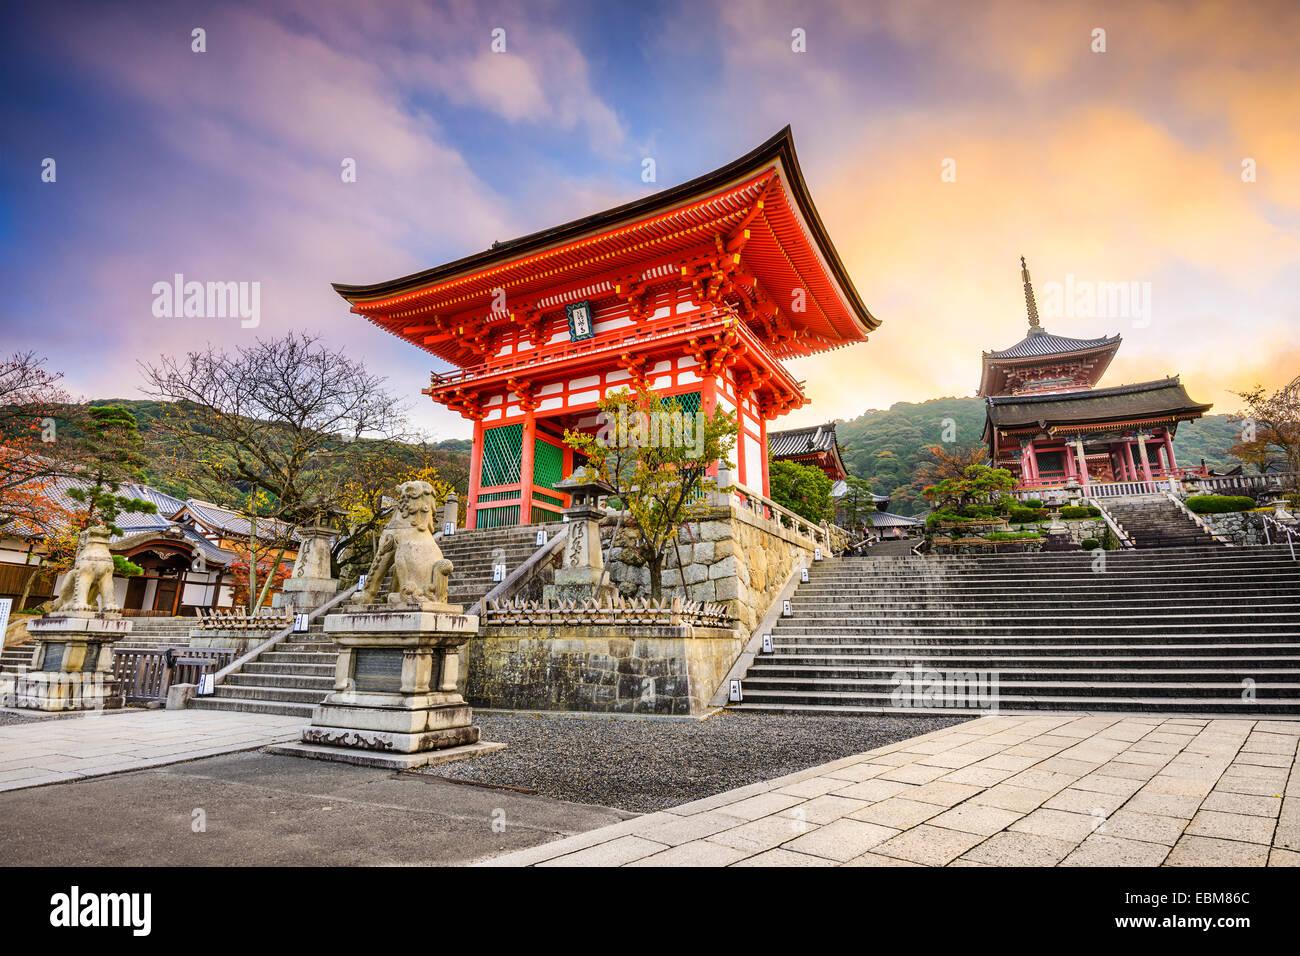 Kyoto, Japan at Kiyomizu-dera Temple. - Stock Image